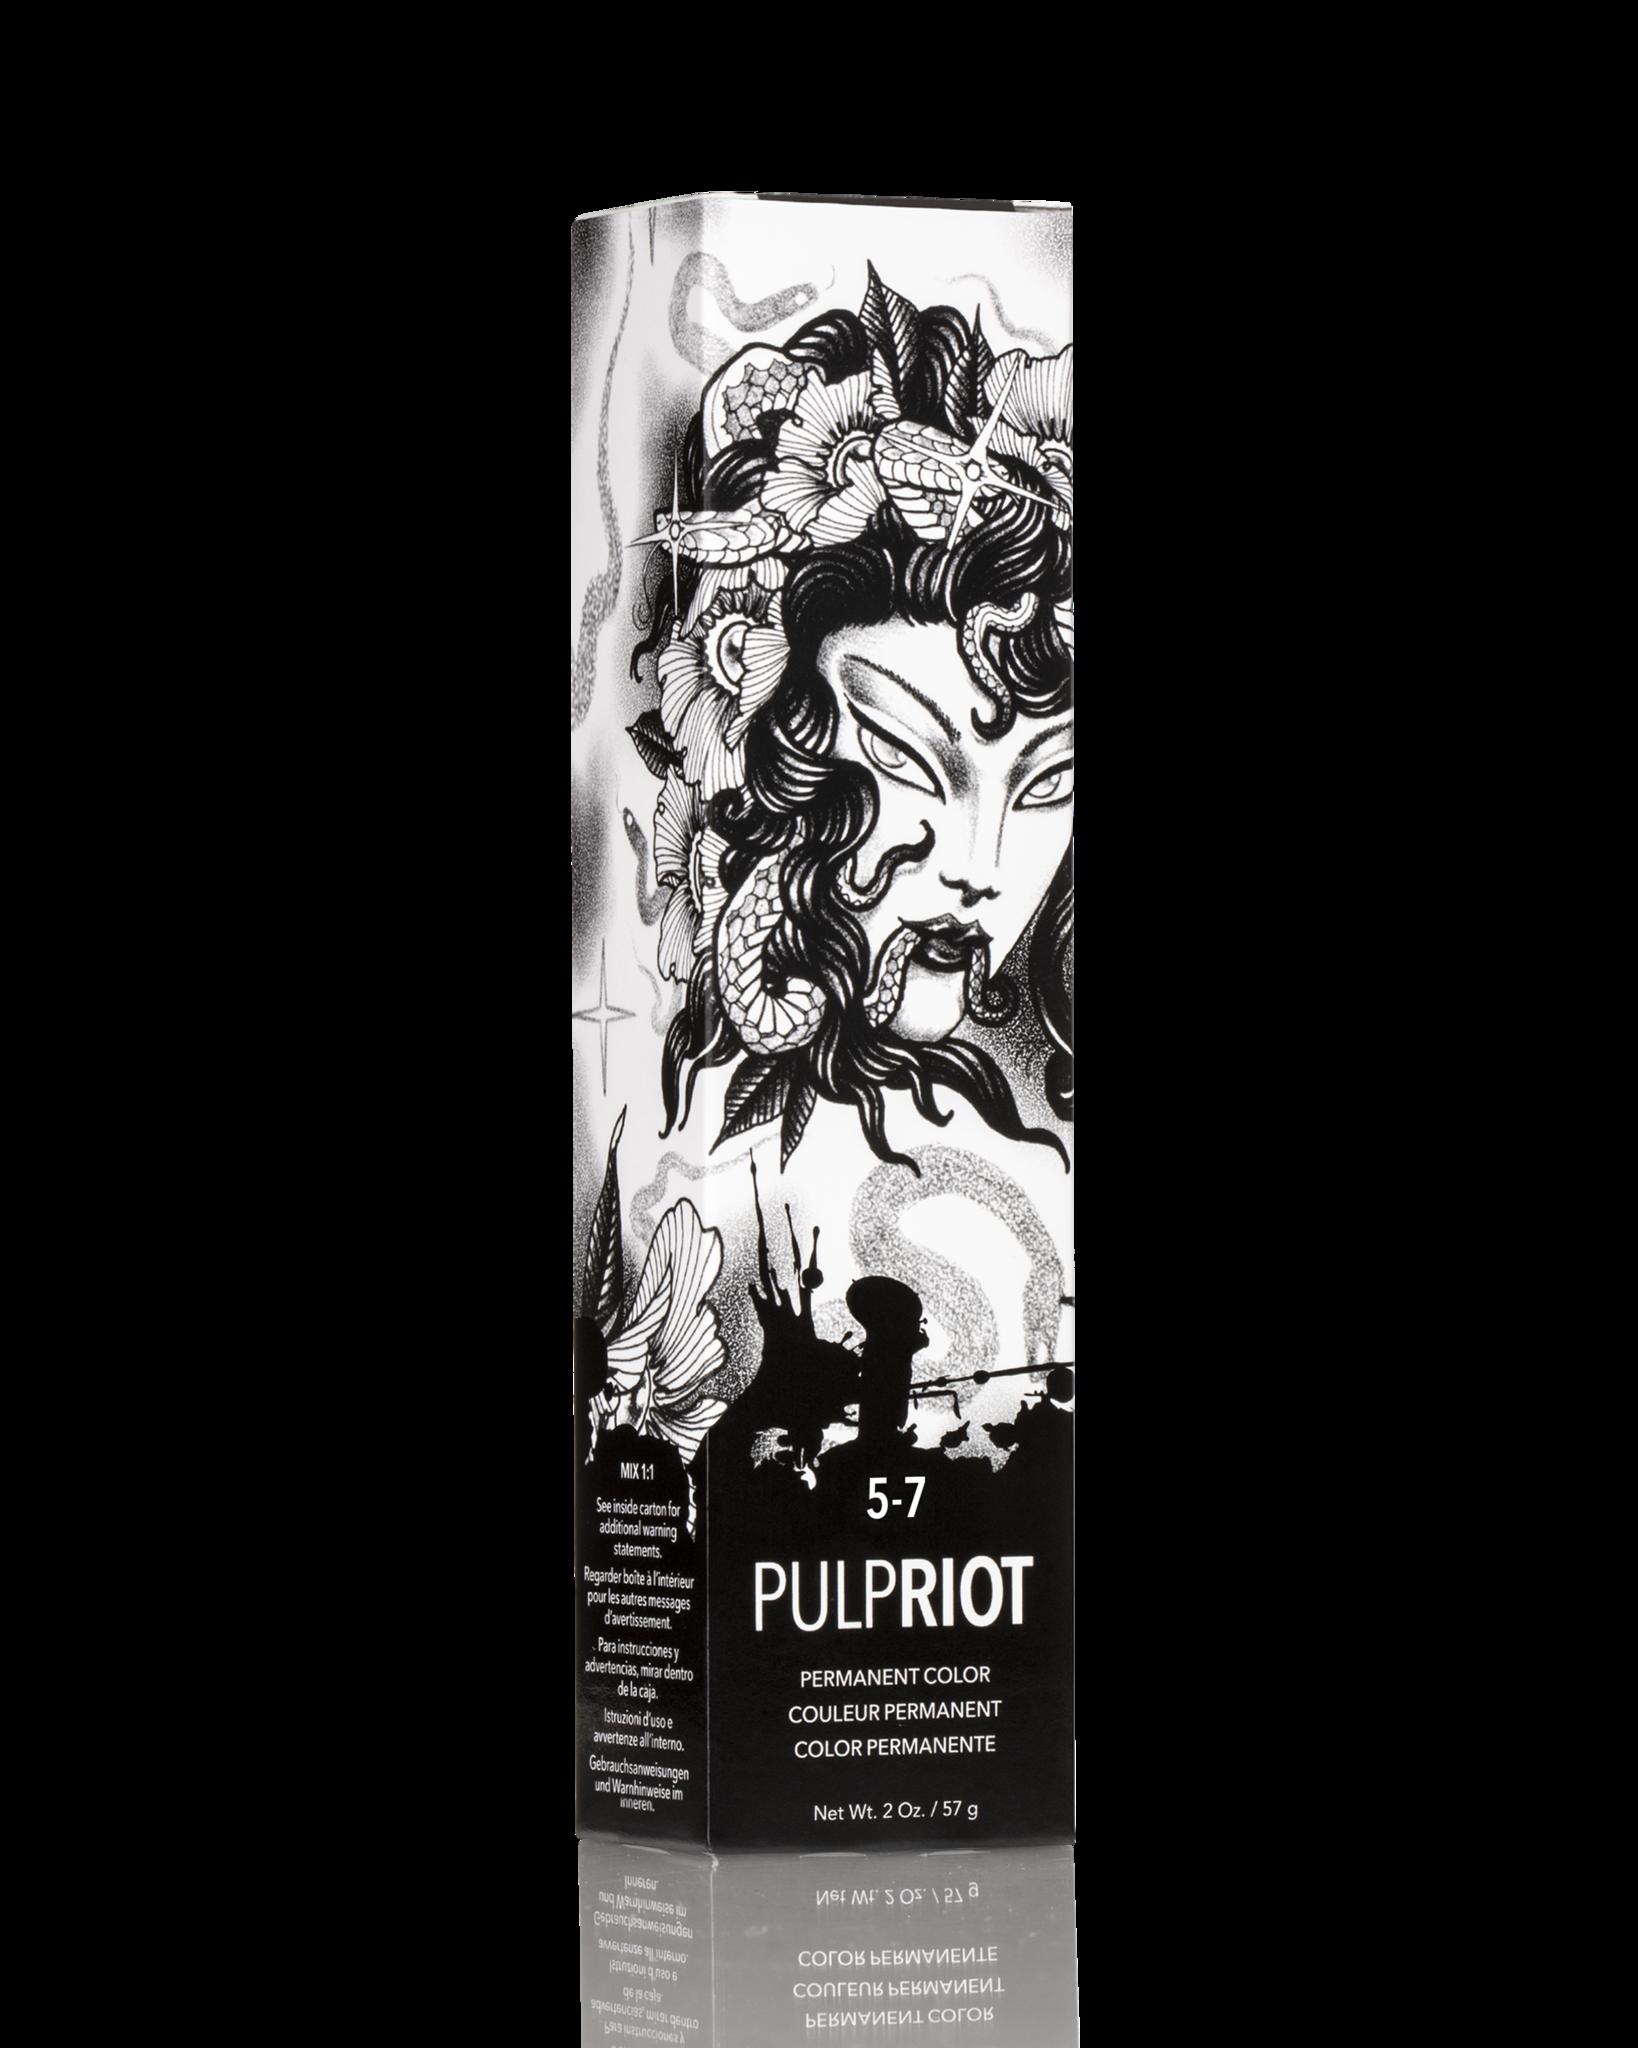 Pulp Riot PULP RIOT FACTION 8 MATE 5-7